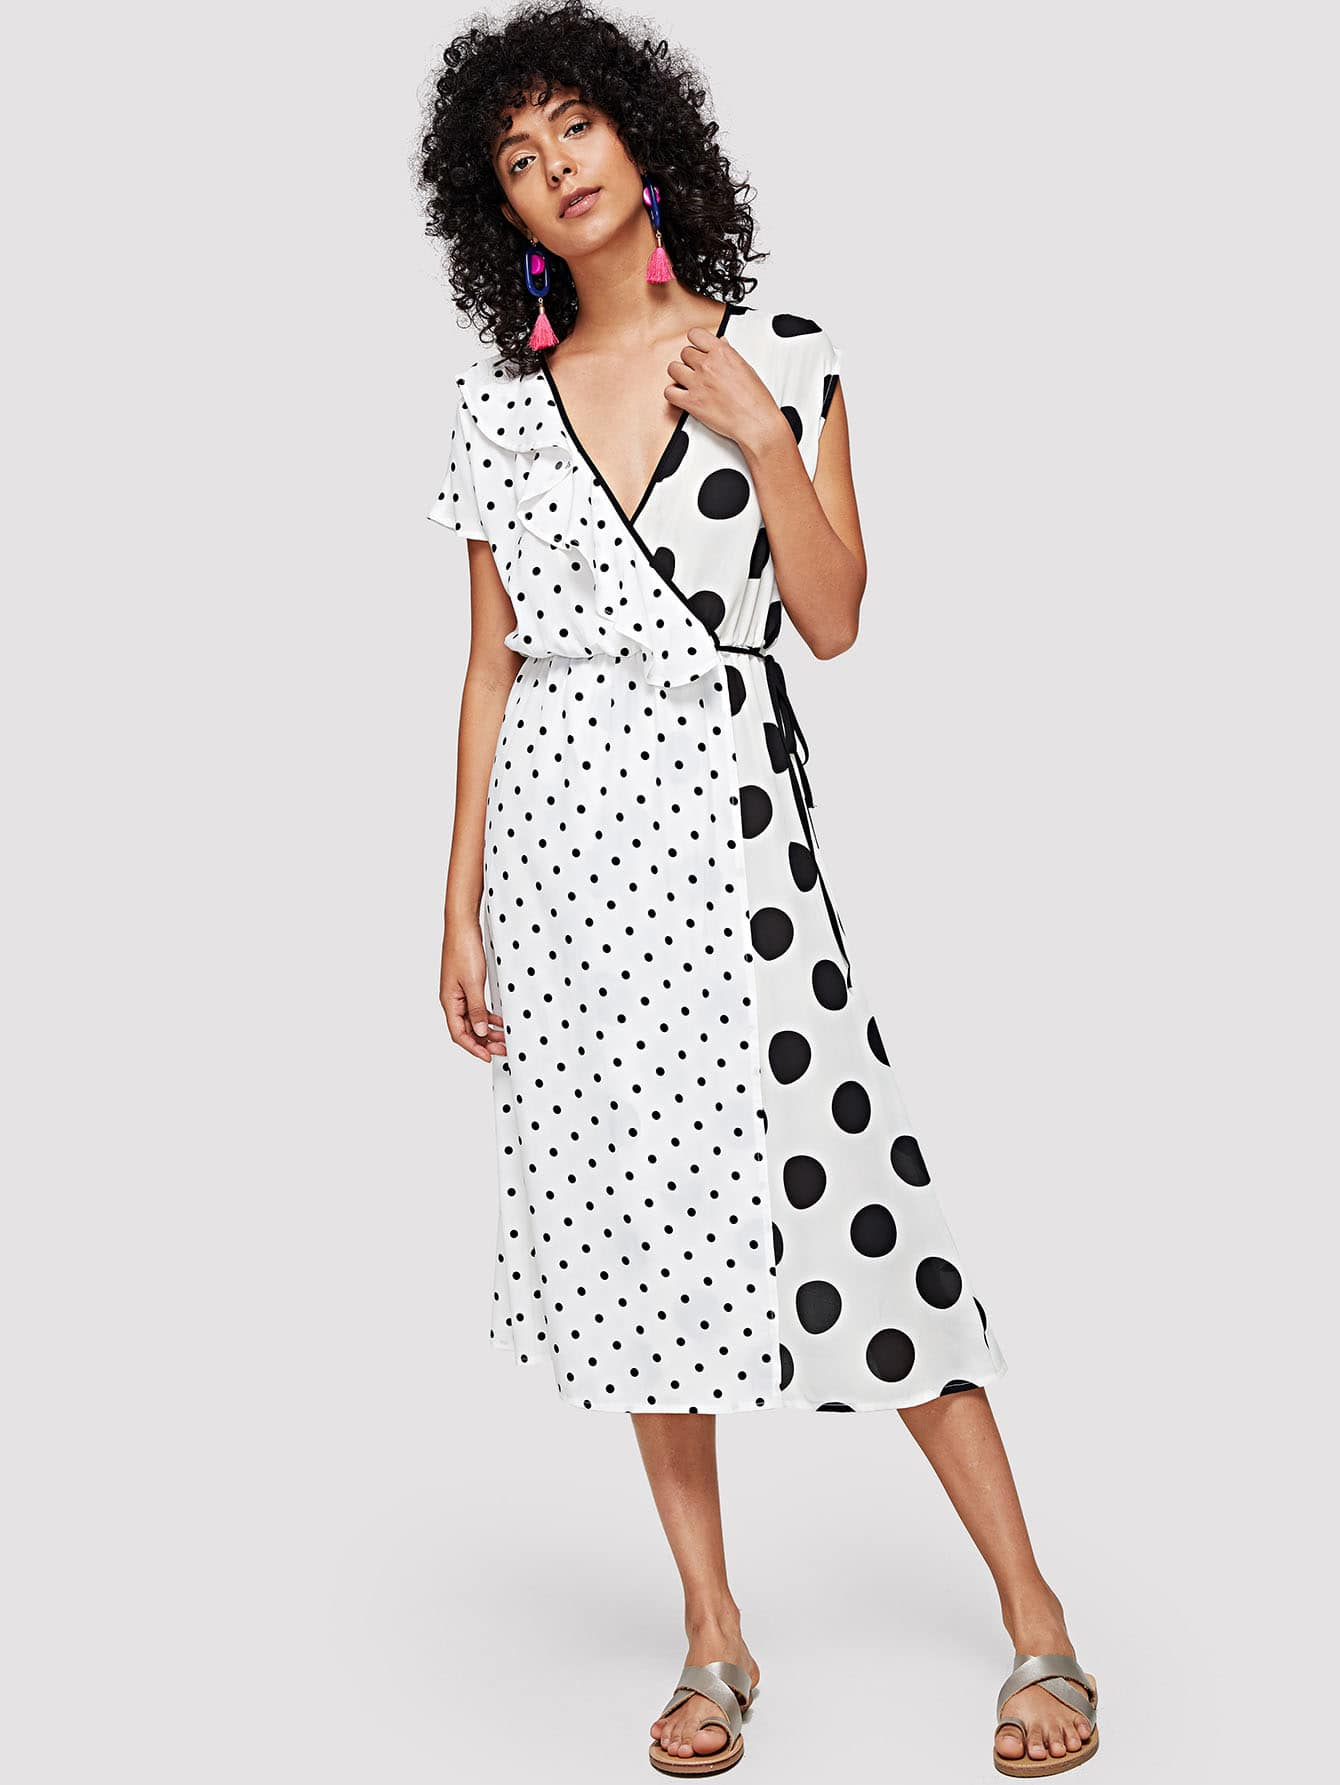 Contrast Binding Ruffle Trim Dot Dress contrast halter and binding layered ruffle bodice jumpsuit